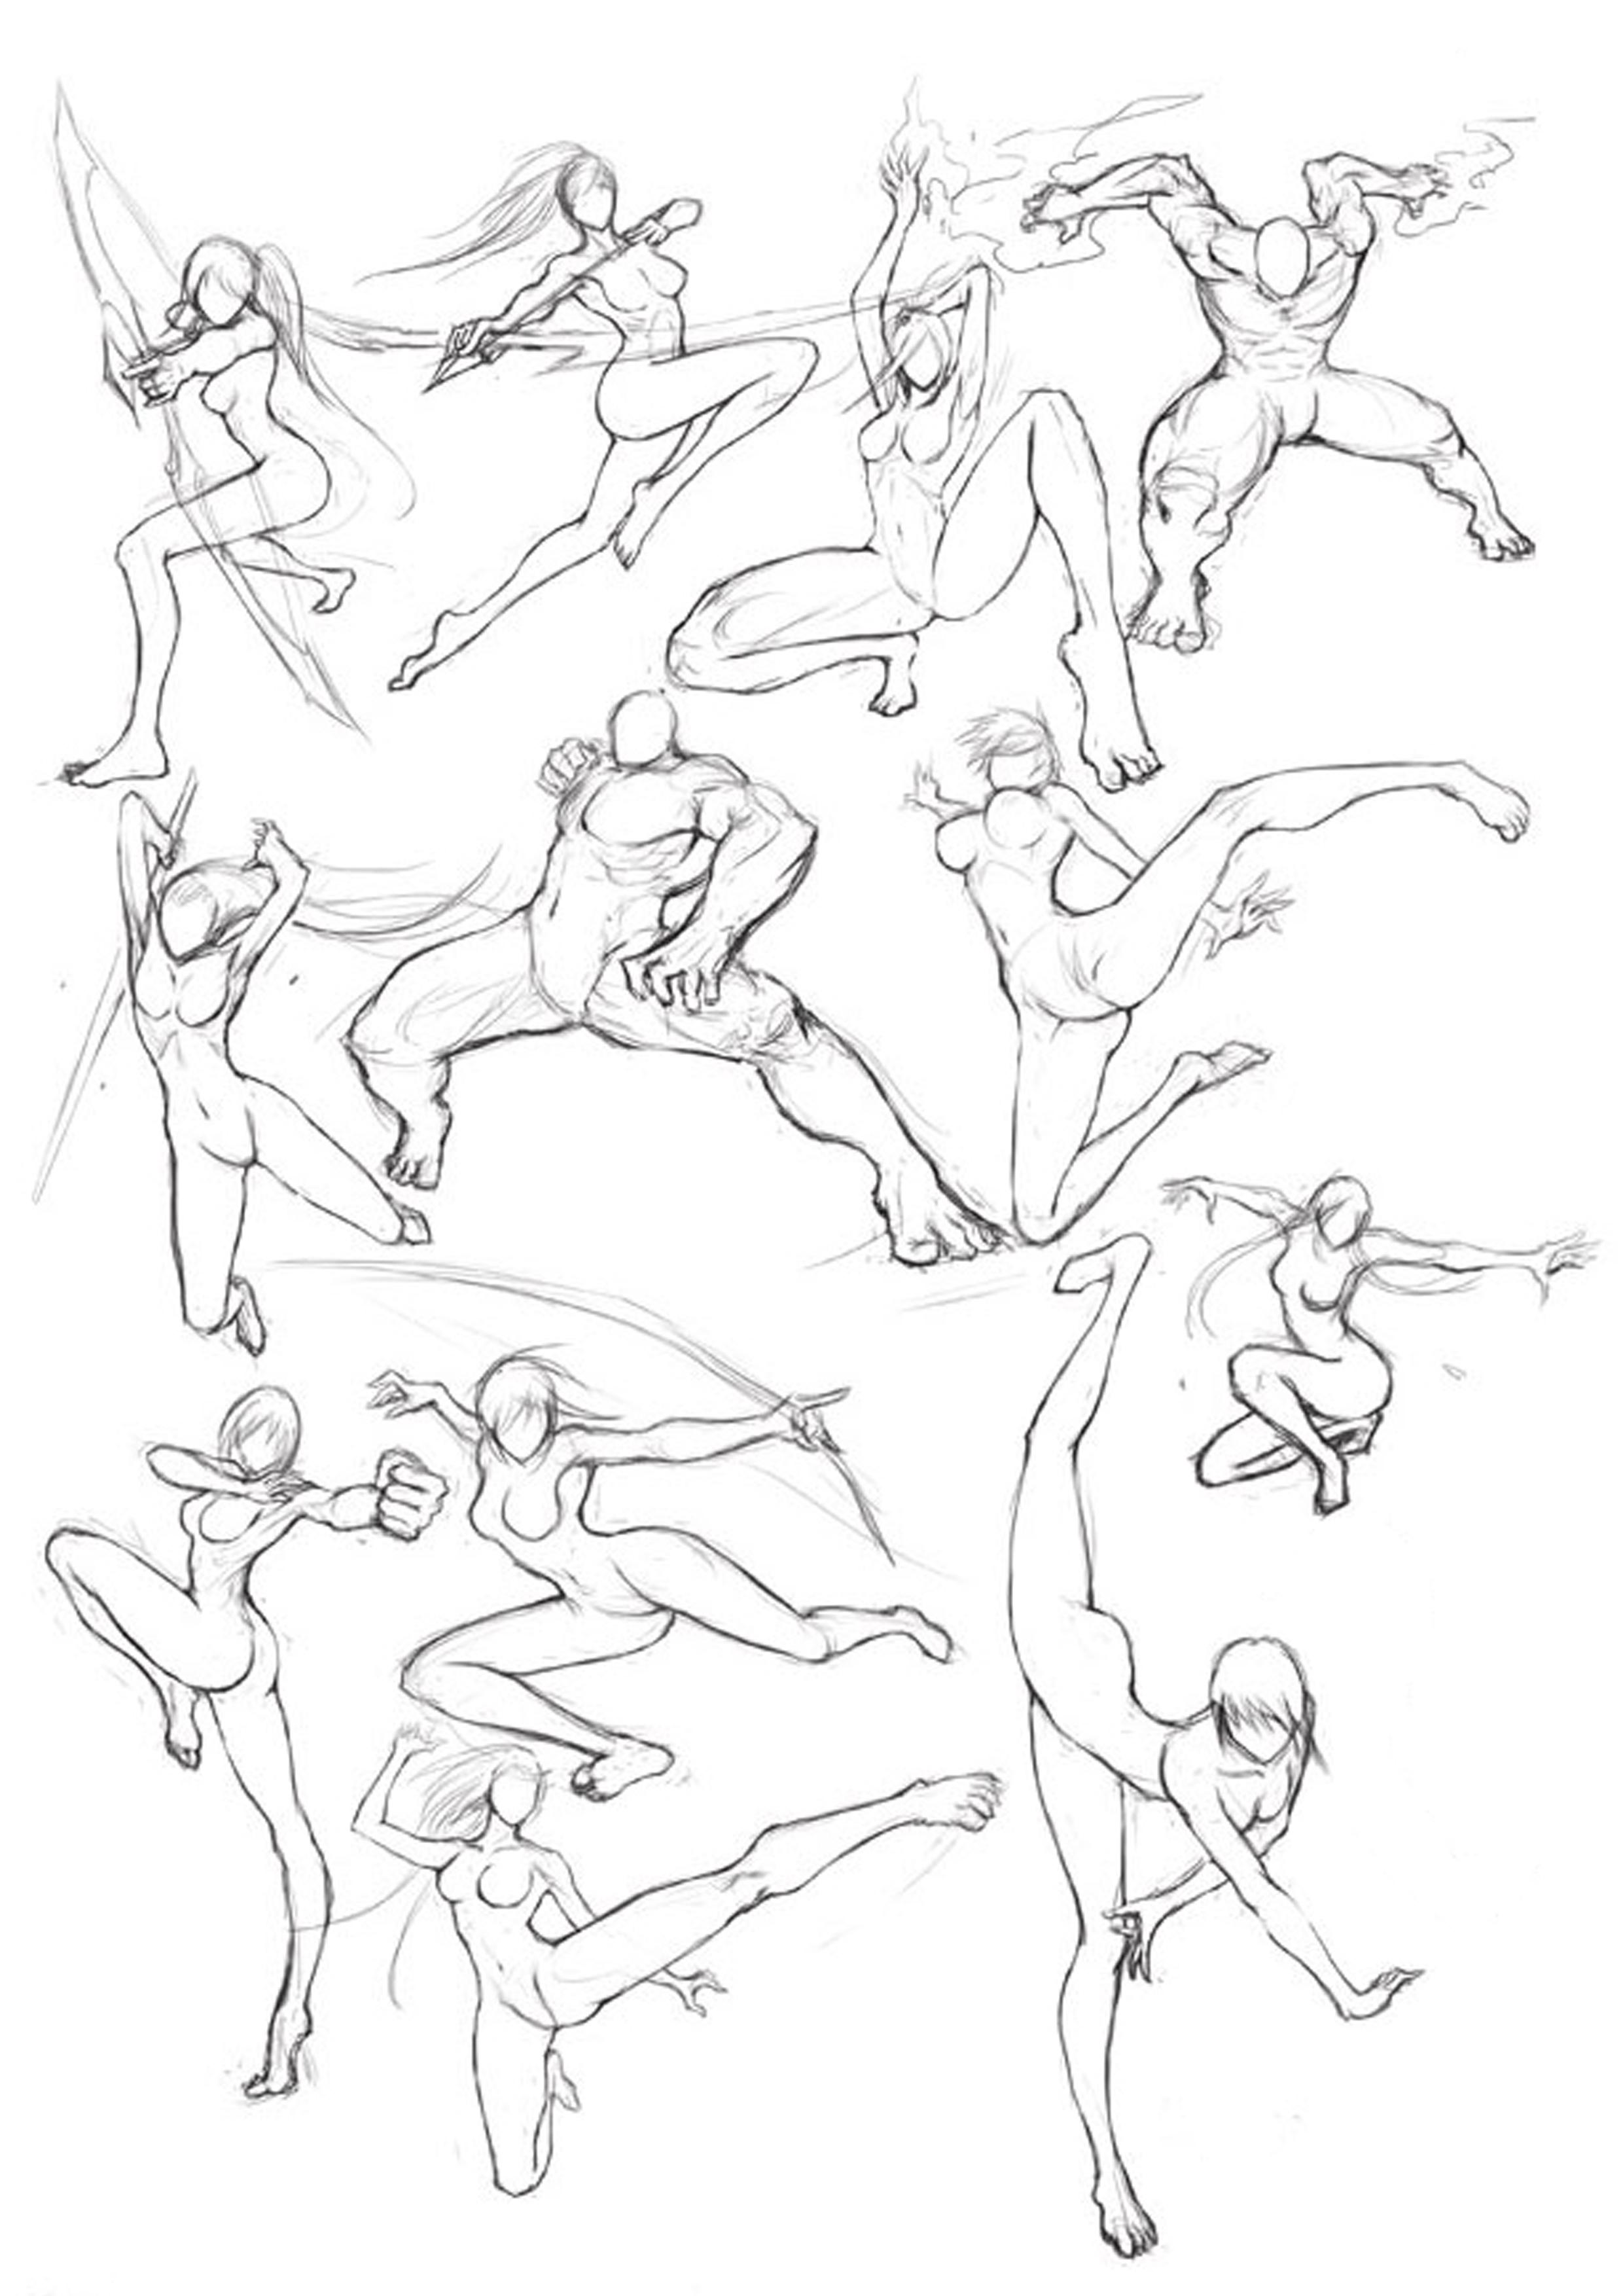 2480x3508 Martial Arts Posture Drawing Technics Drawings